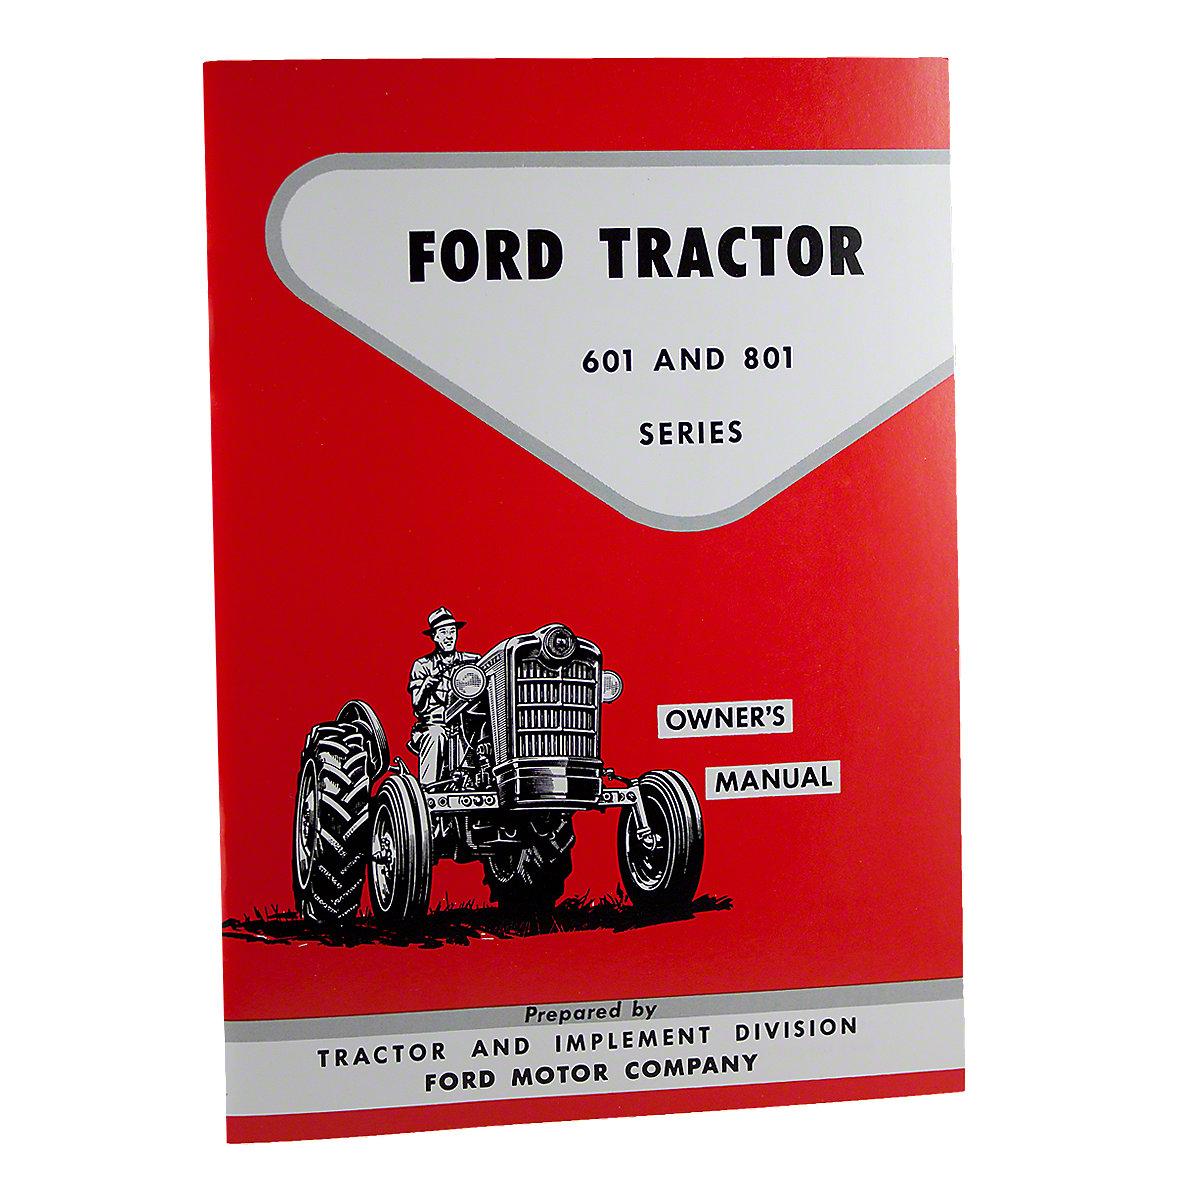 rep1679 operator manual reprint rh steinertractor com ford 801 parts manual ford 801 shop manual